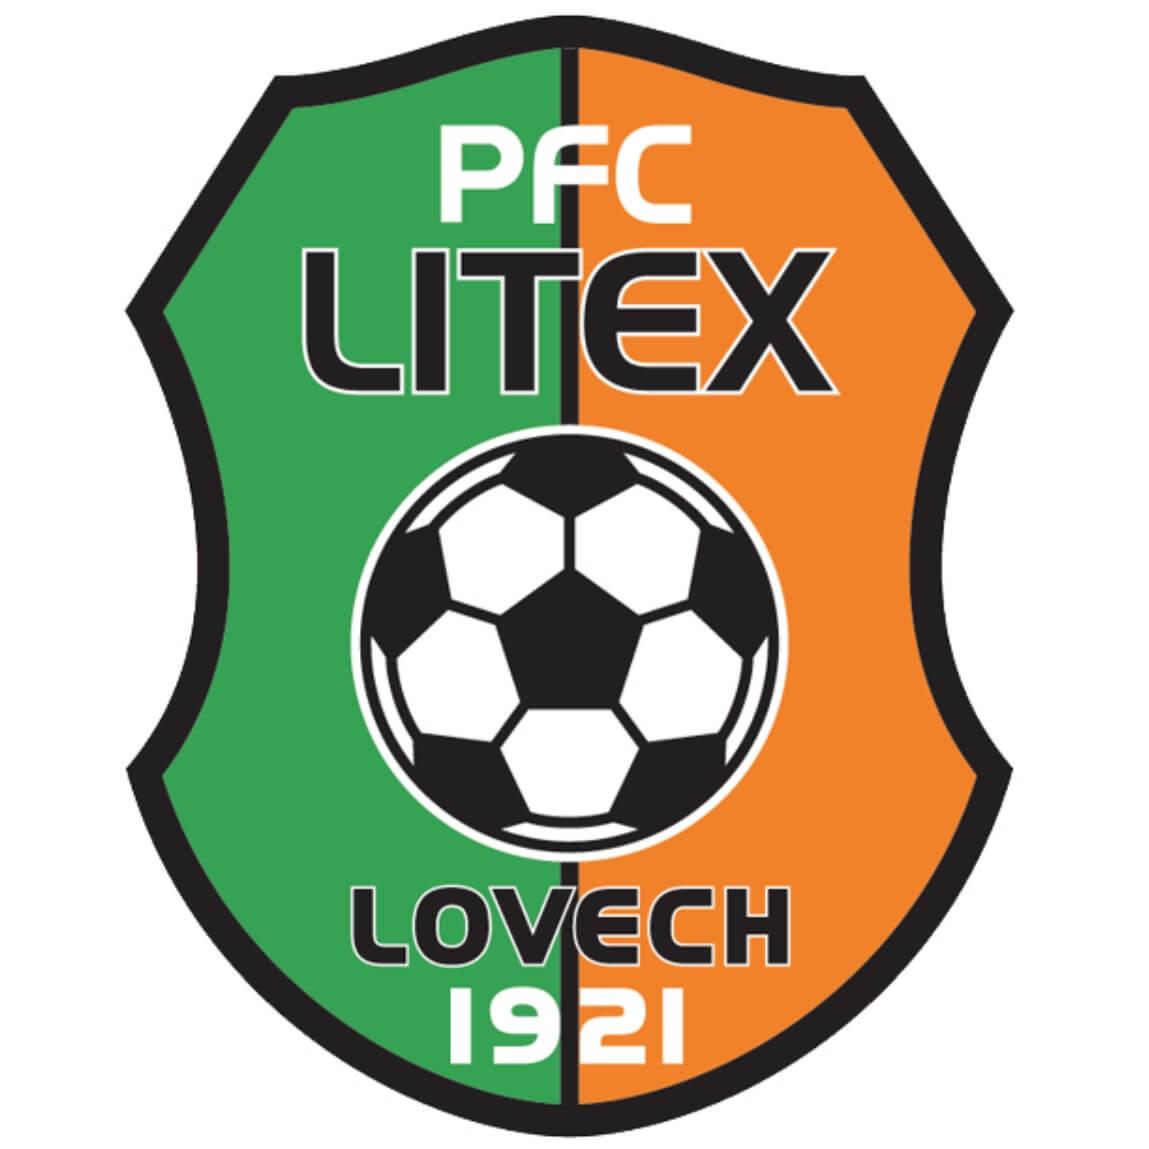 PFC Litex Lovec